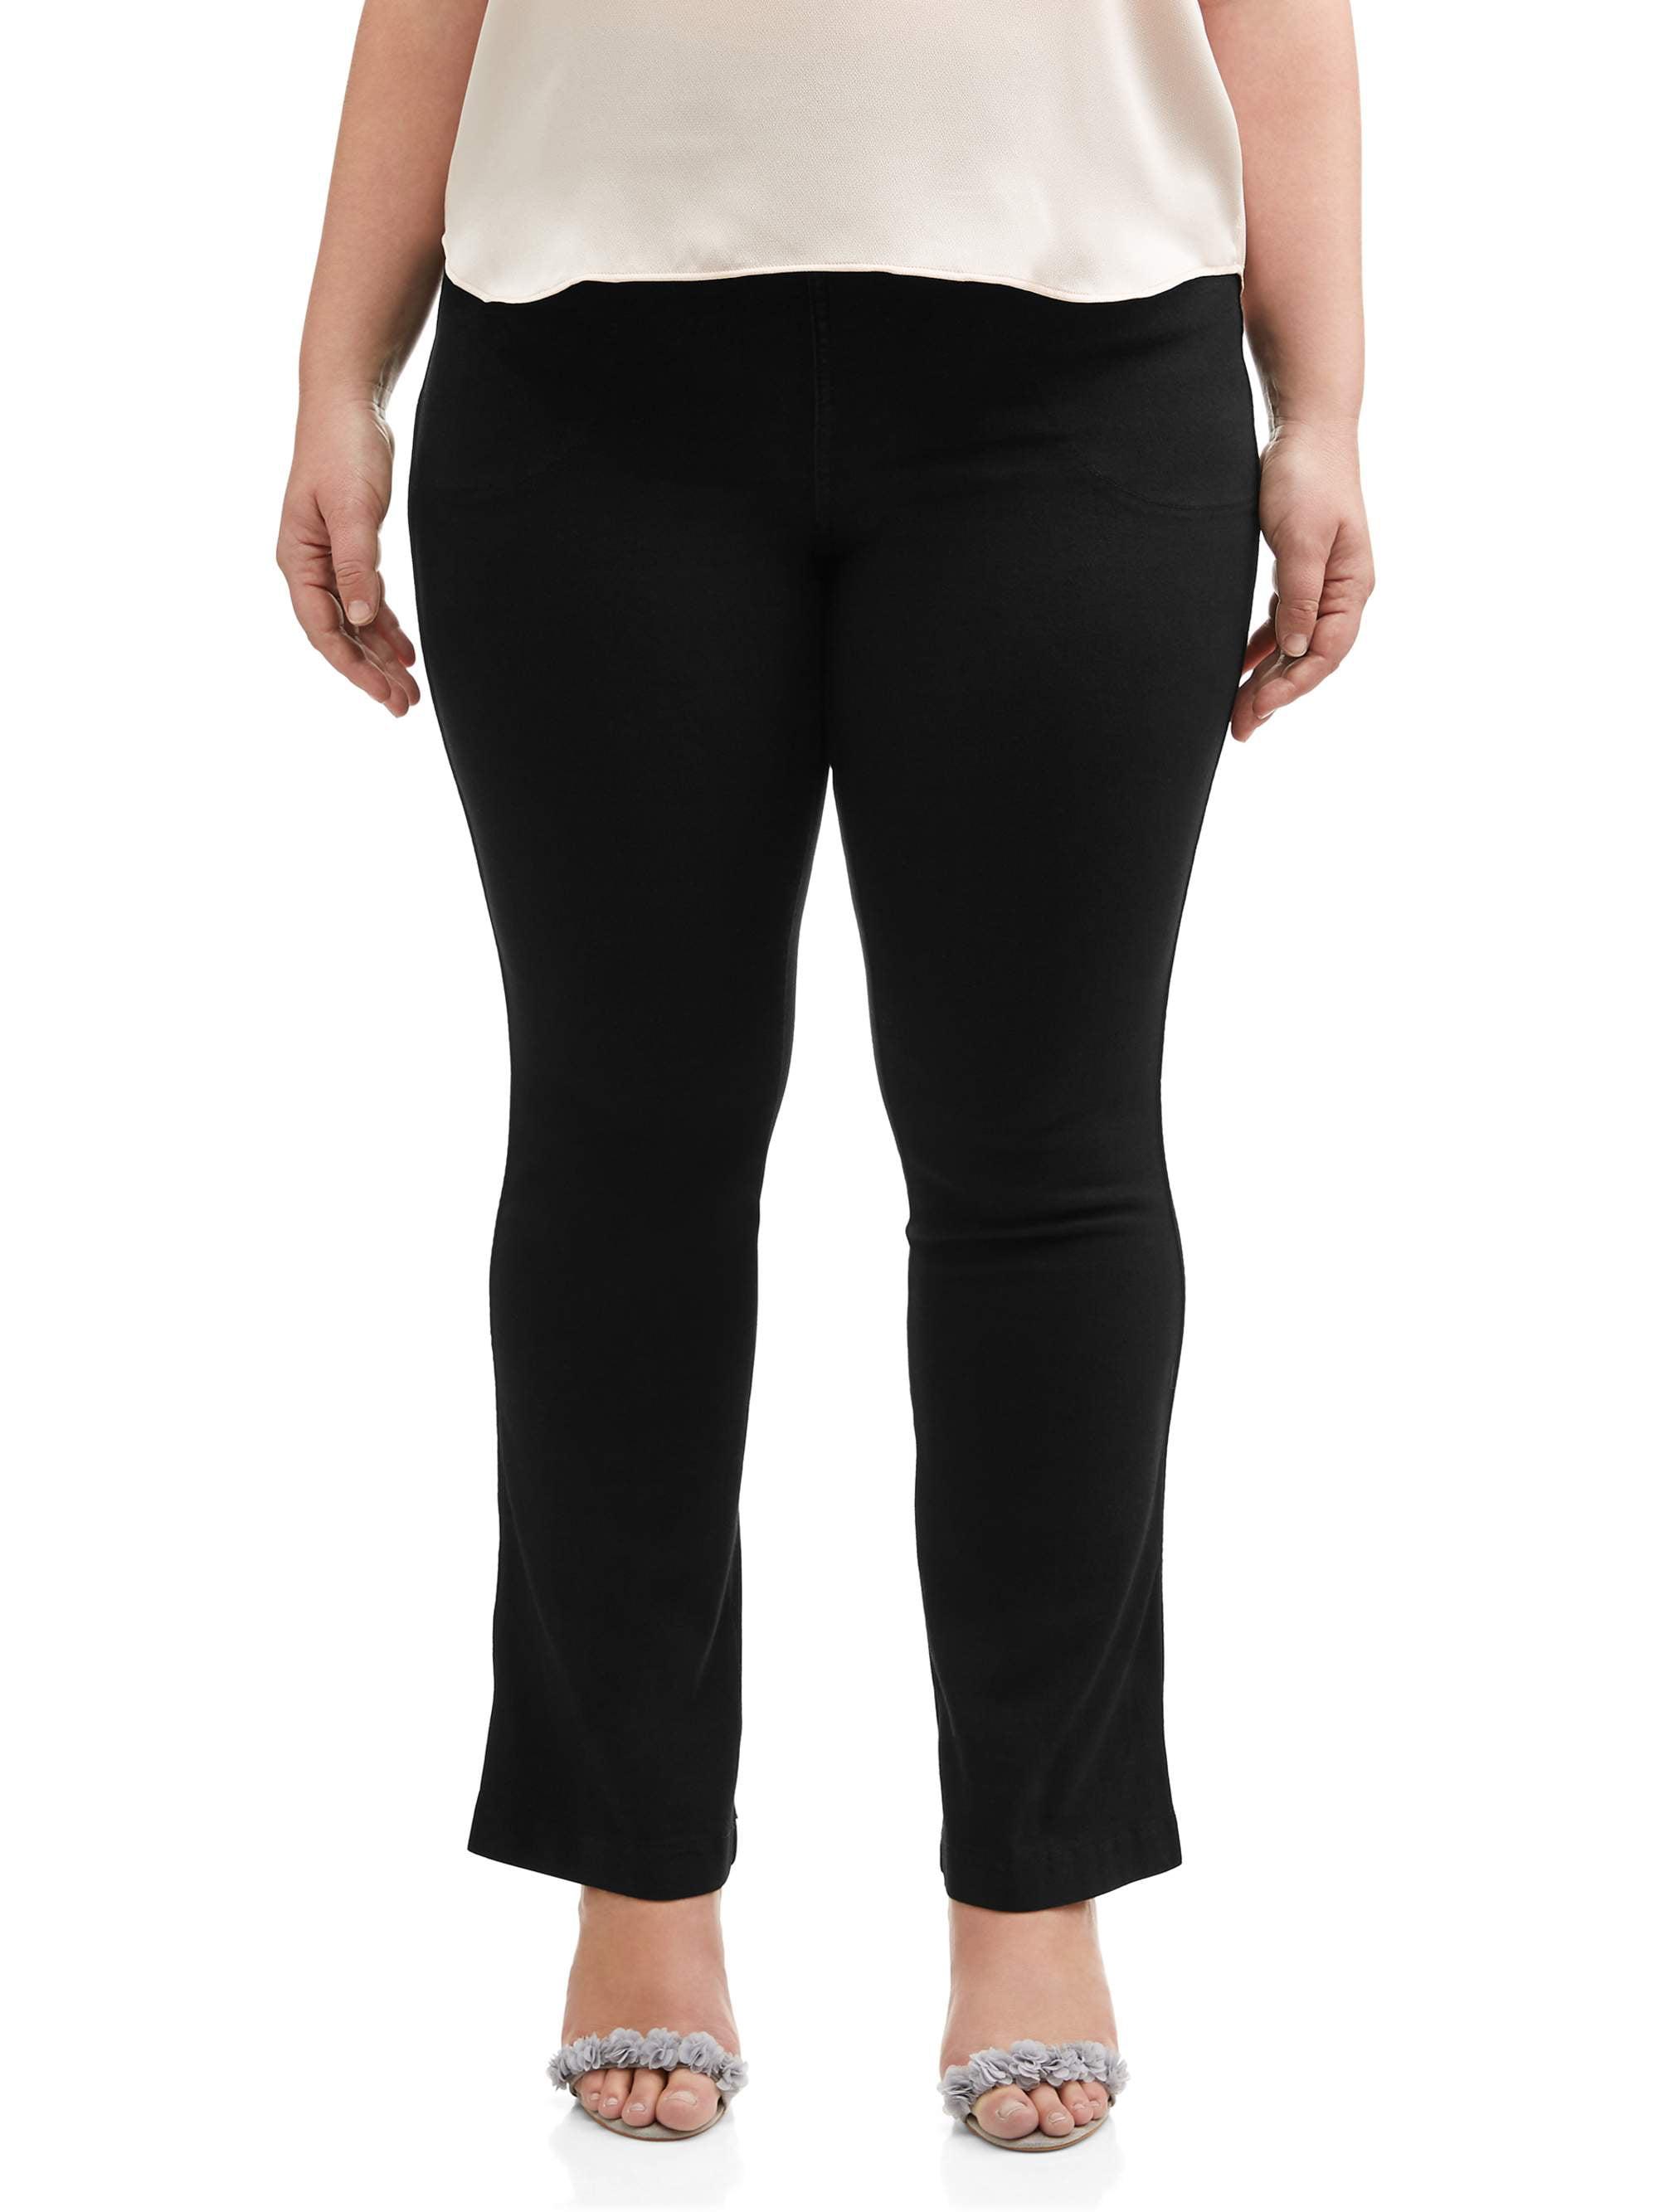 Petite Length 3X Medium Stone JUST MY SIZE Womens 4-Pocket Bootcut Jeans